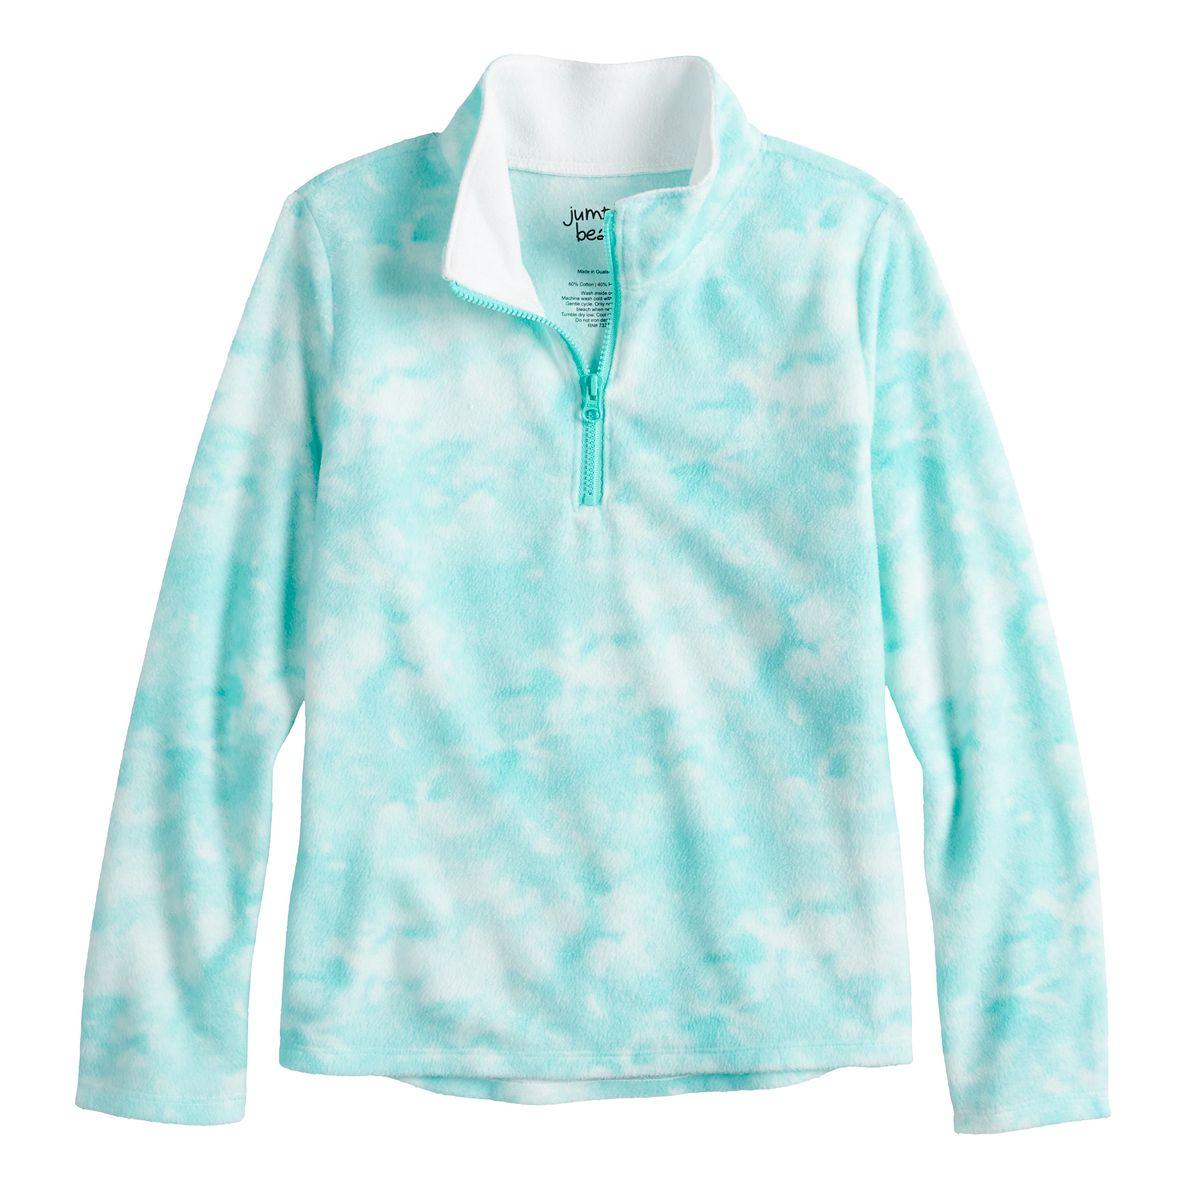 Kohls Cardholders: Girls 4-8 Jumping Beans Microfleece Quarter Zip Pullover $3.50 + free store pickup